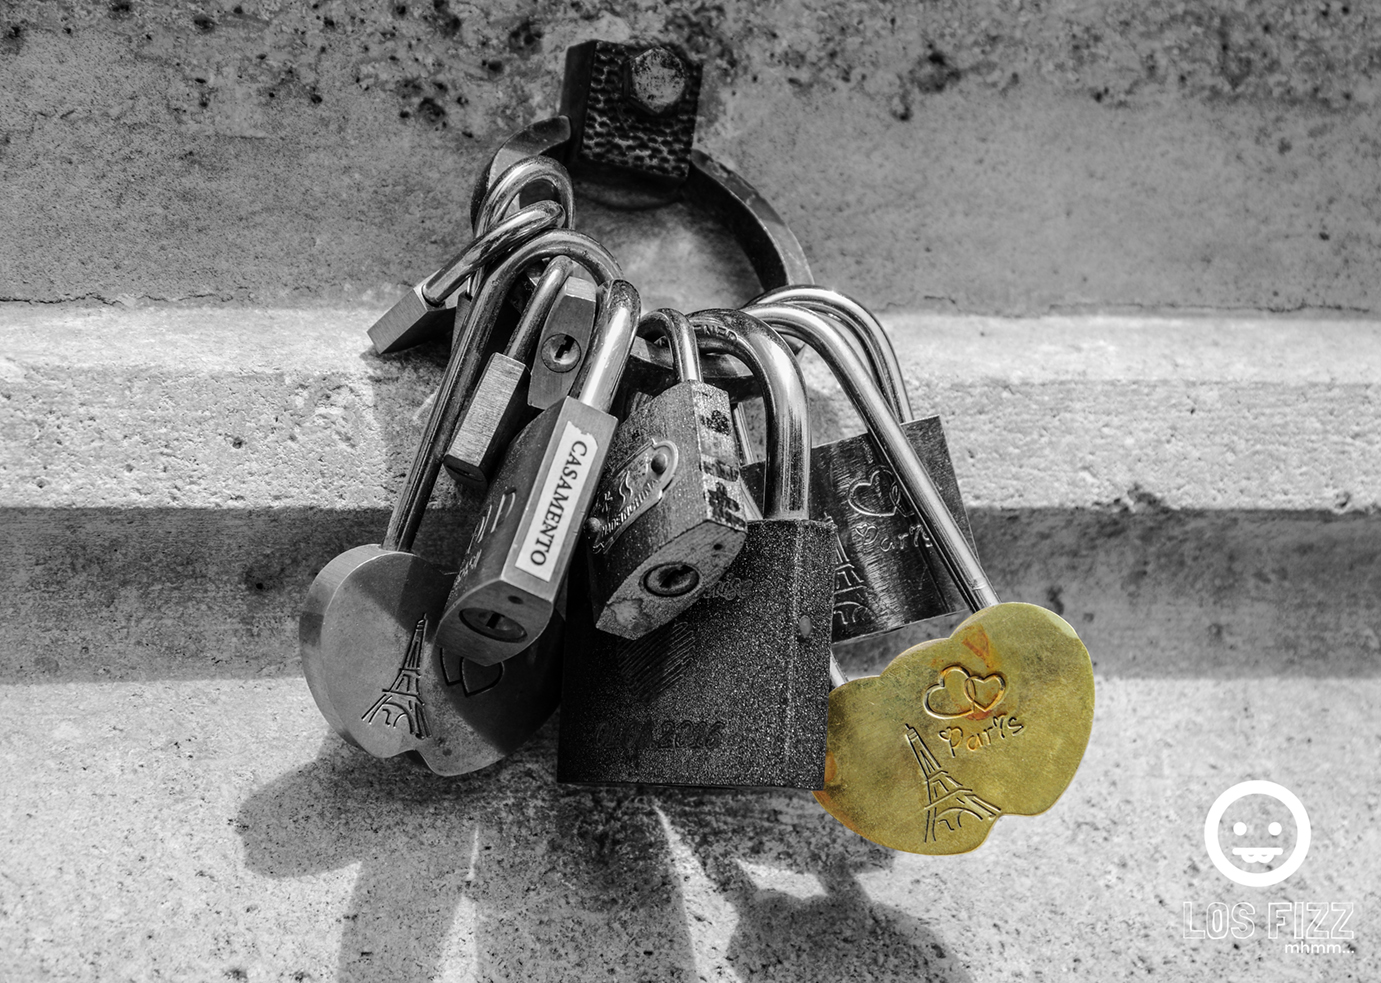 Paris love lock. Photo by LosFizz